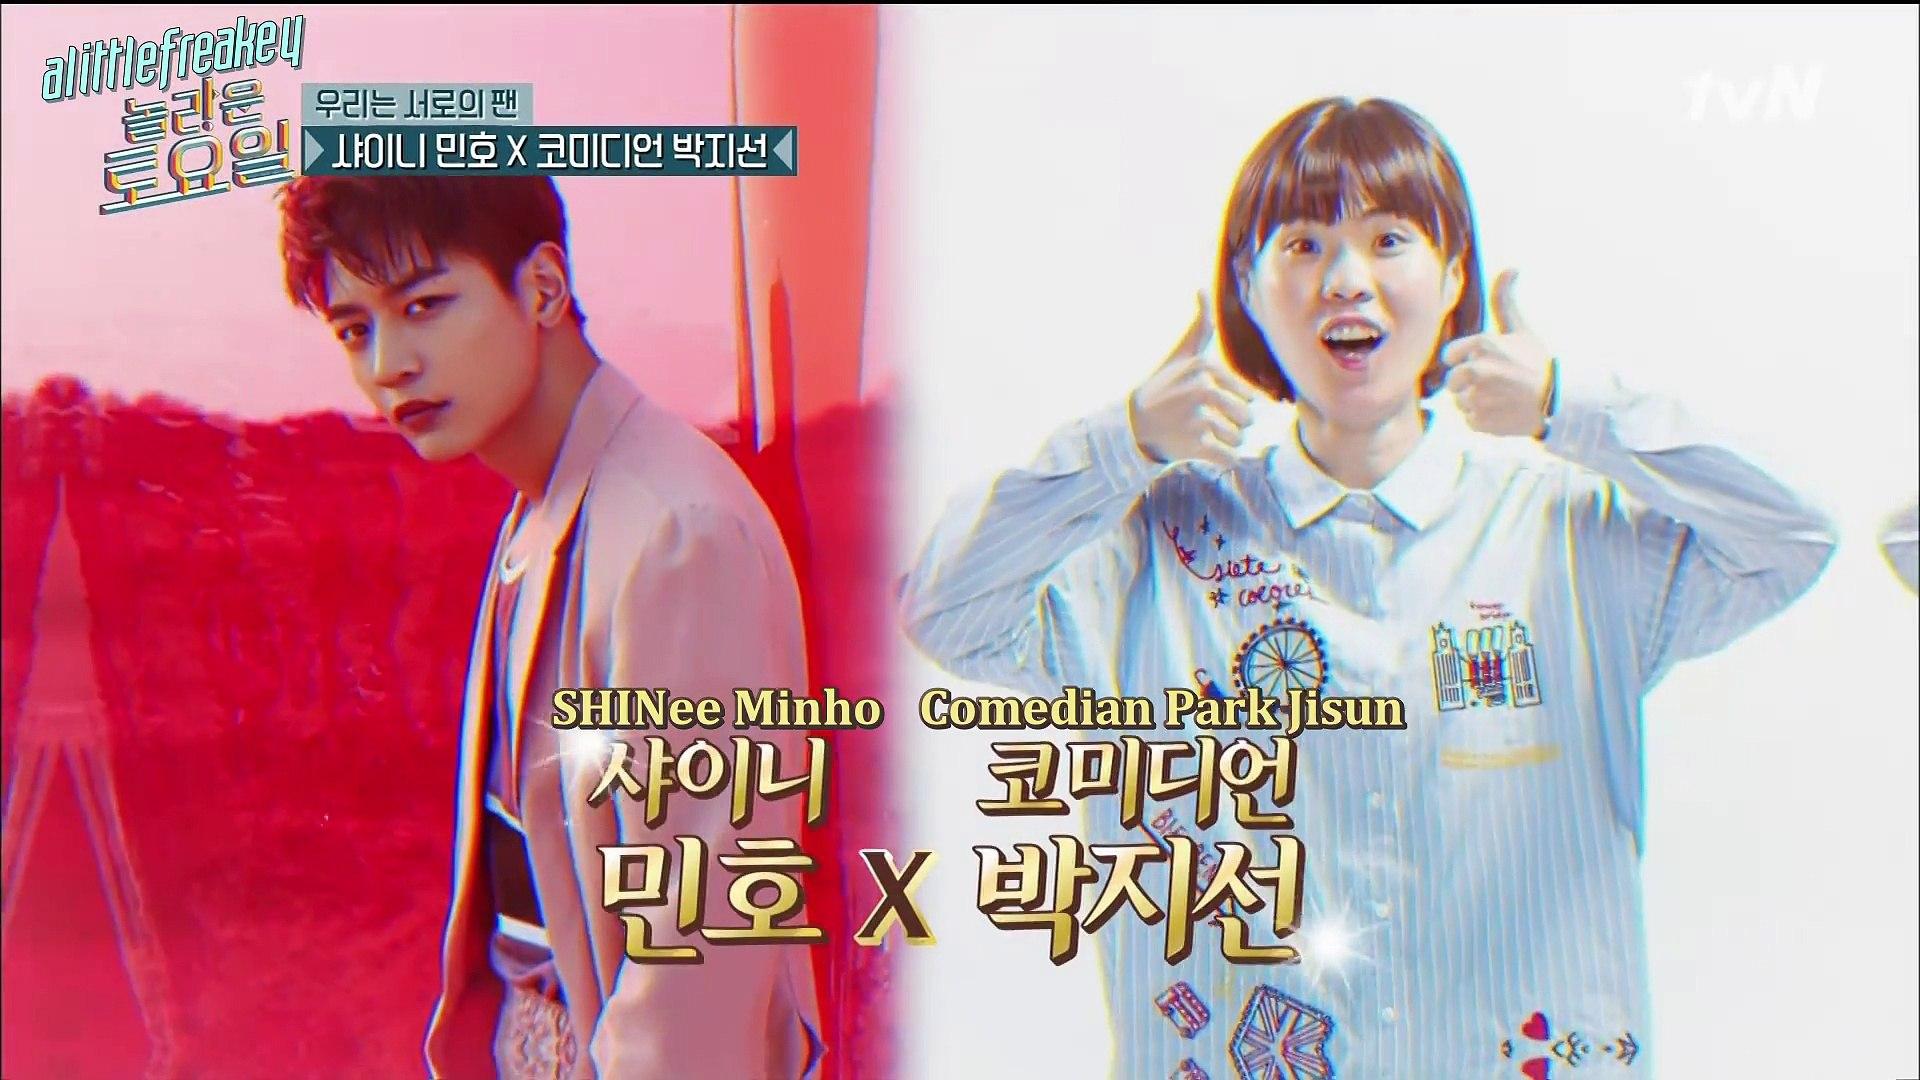 181020 Amazing Saturday (Eng Sub) Part 1/2 - SHINee Key & Minho